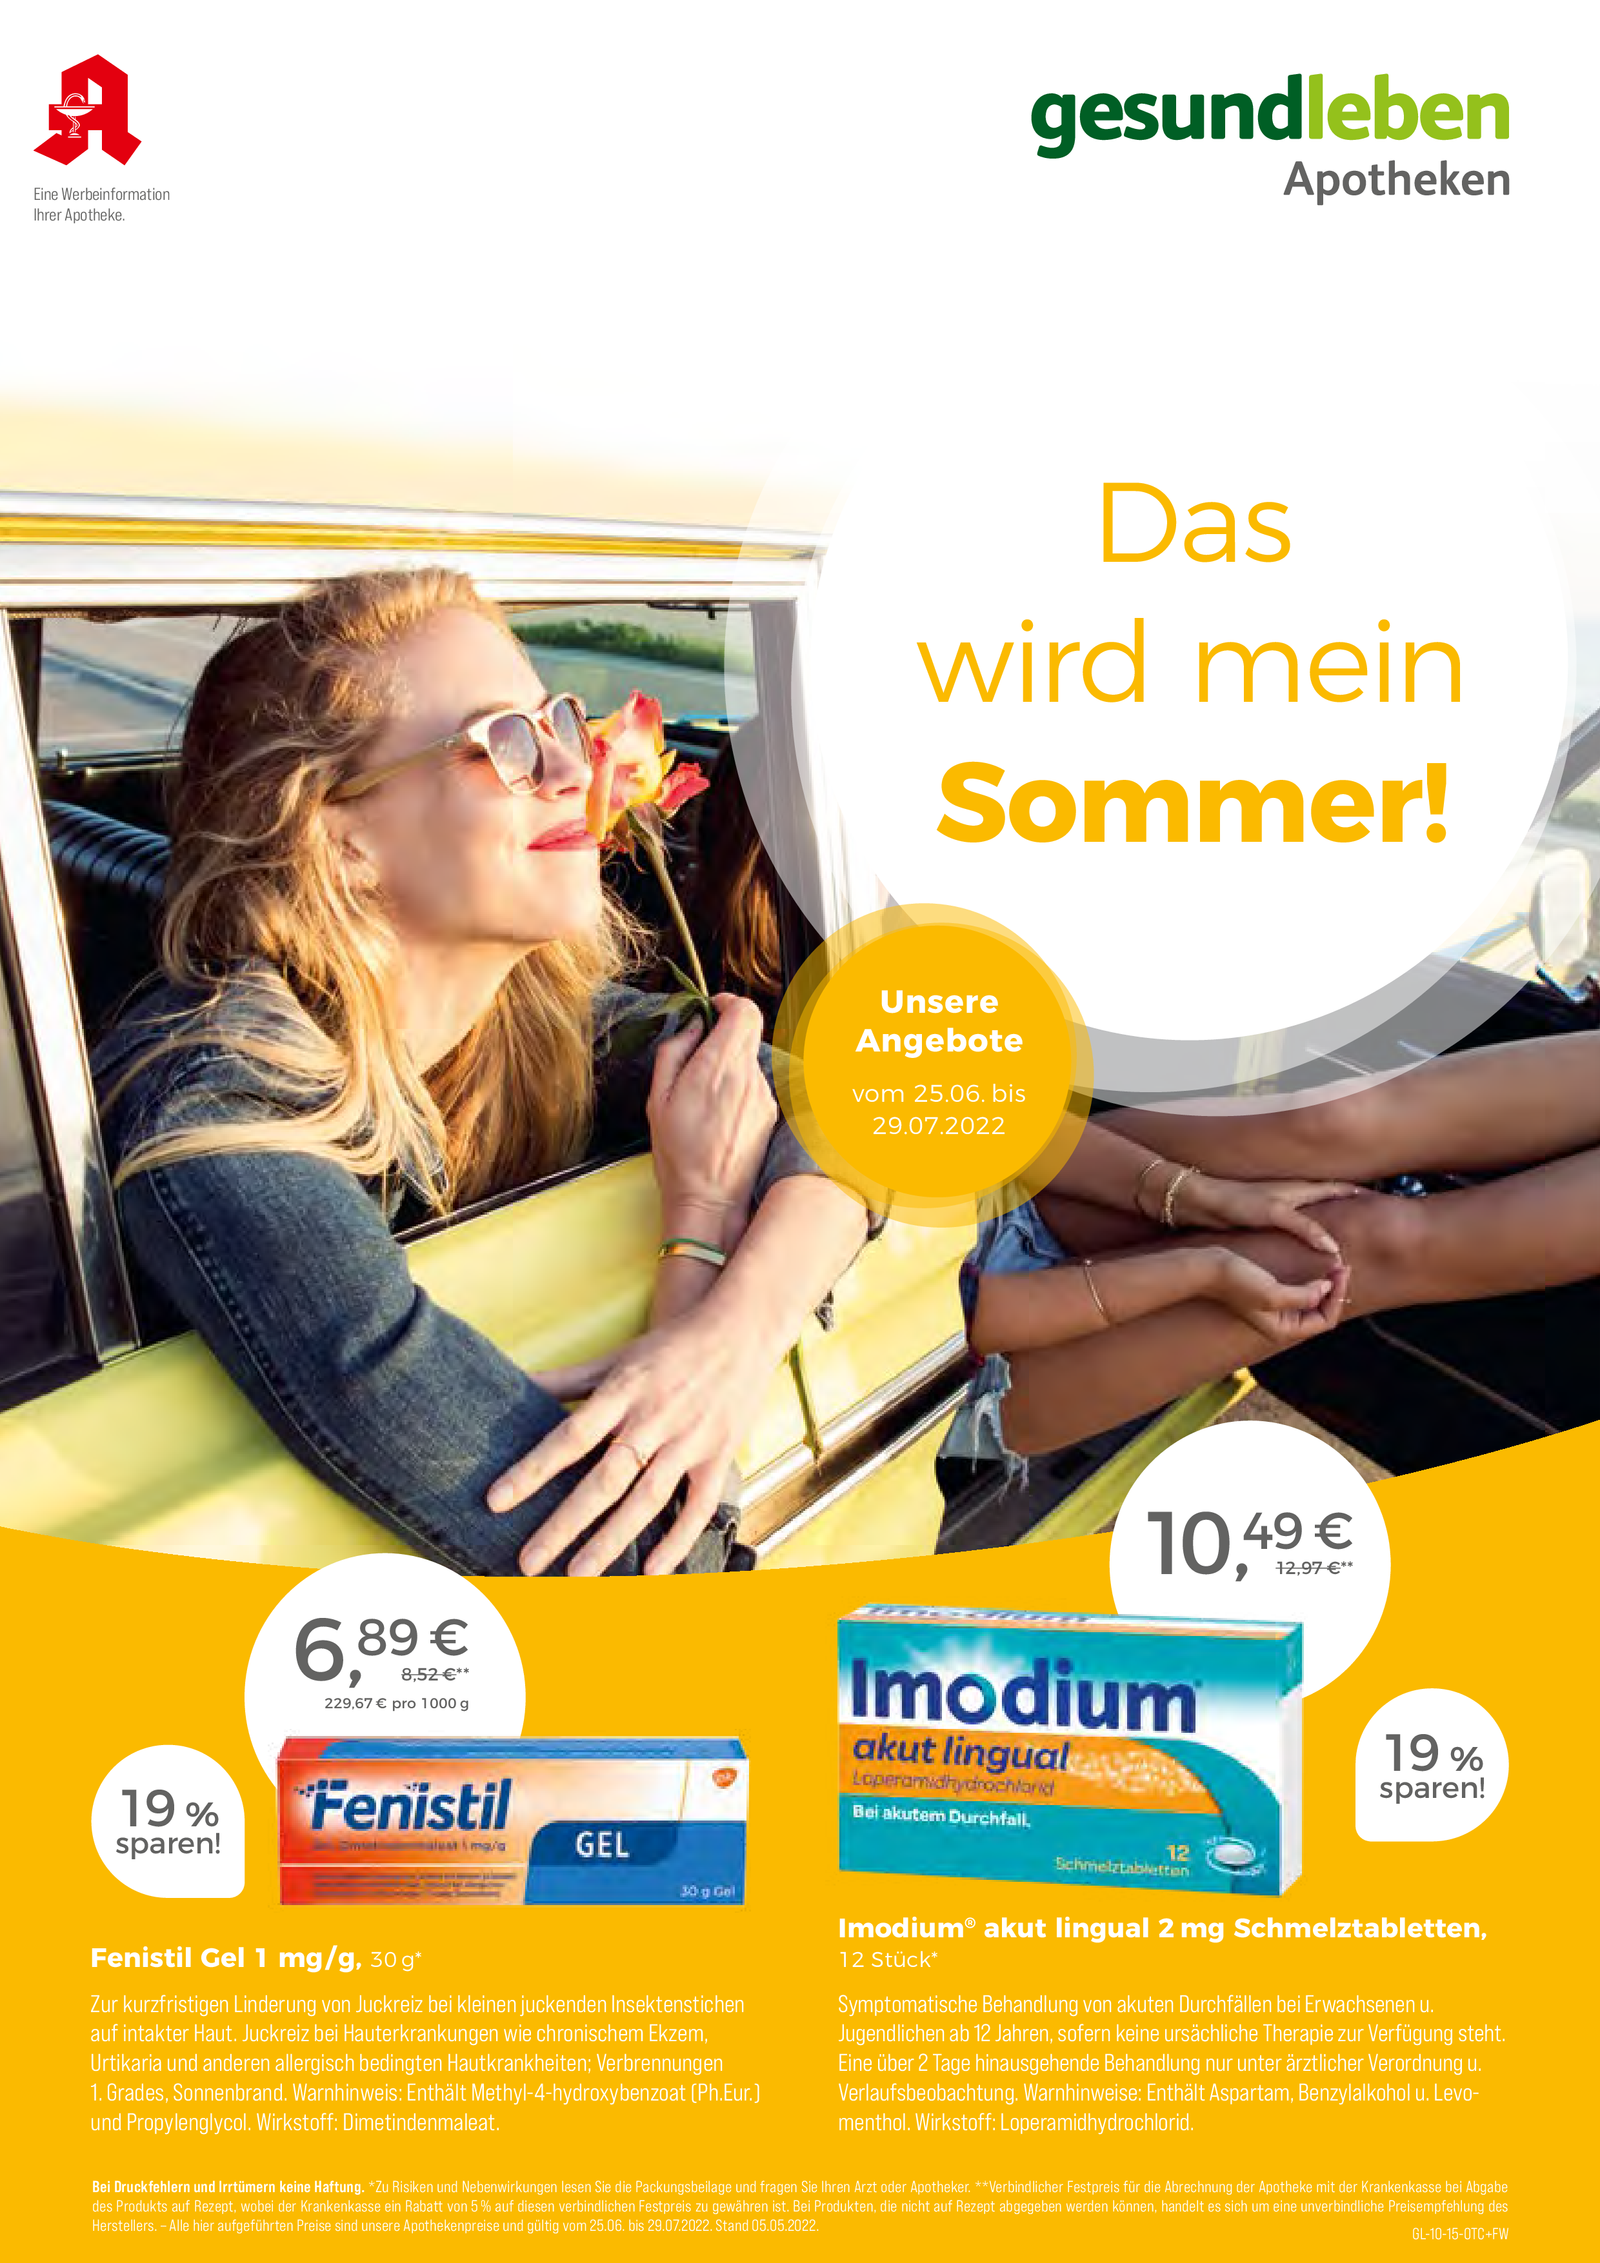 https://mein-uploads.apocdn.net/14700/leaflets/gesundleben_niedrig-Seite1.png